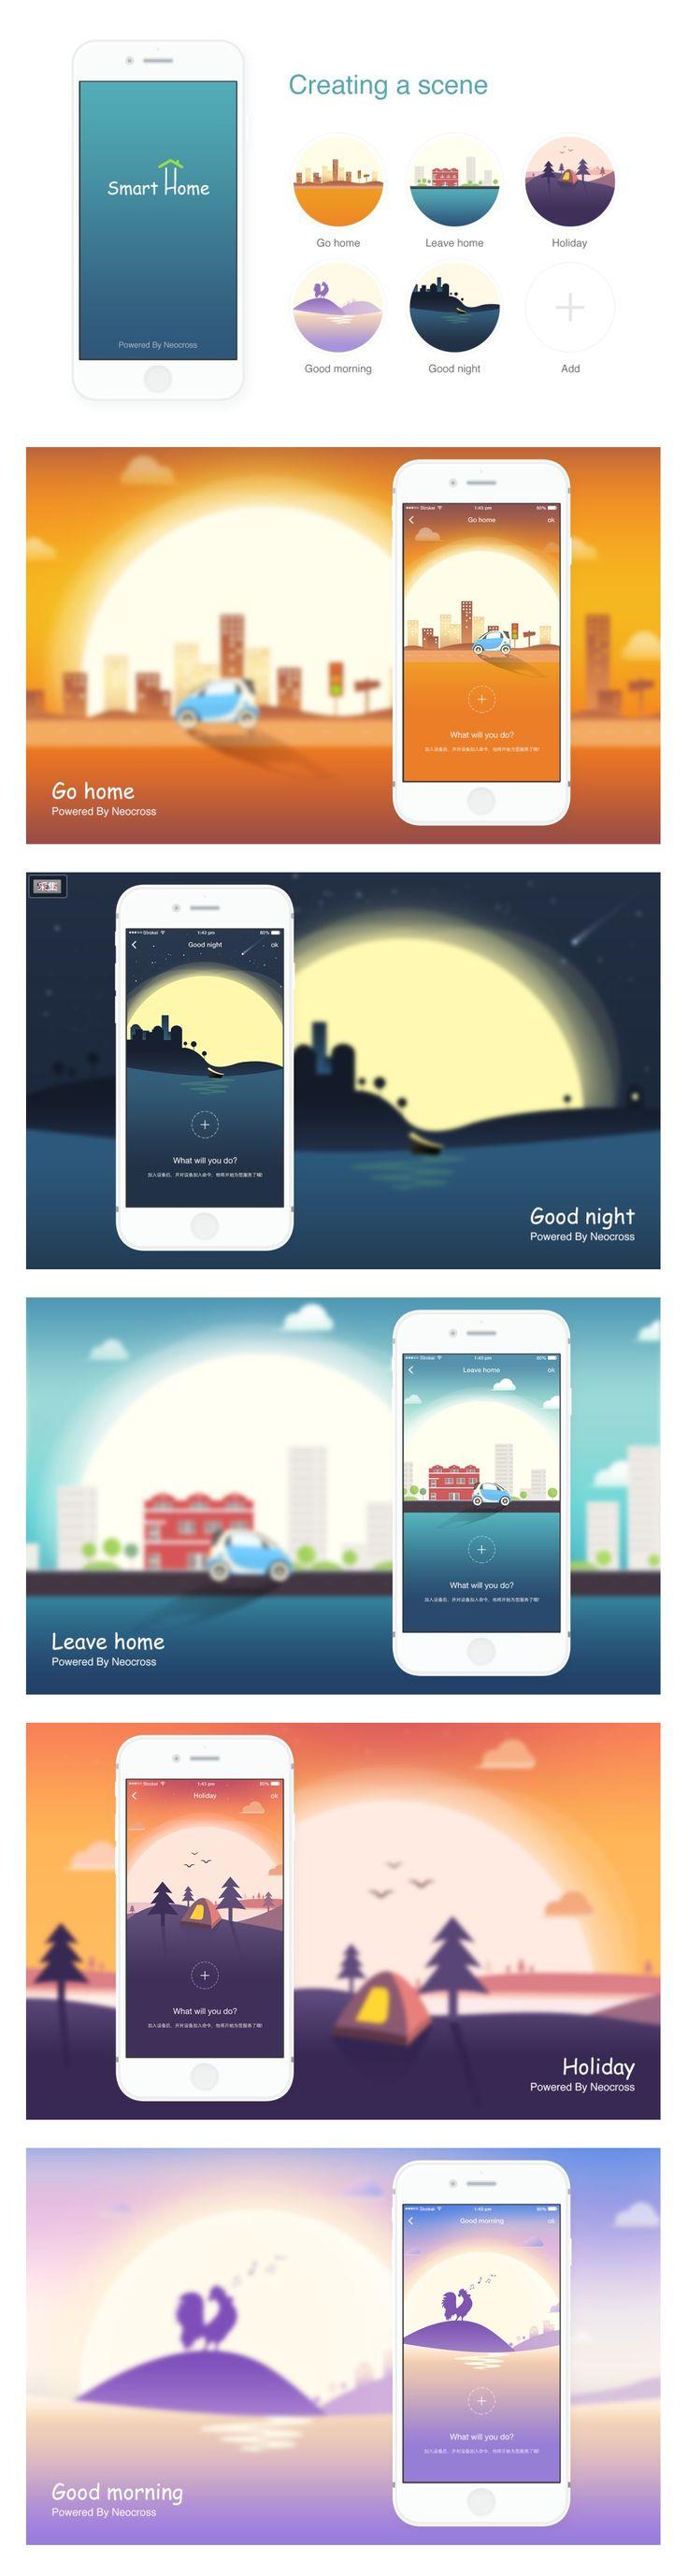 15 best app game images on pinterest flat design game design 1acace1fc53f2e43265bdb0c2a3d45ce png 976 3653 circle uimobile app designmobile